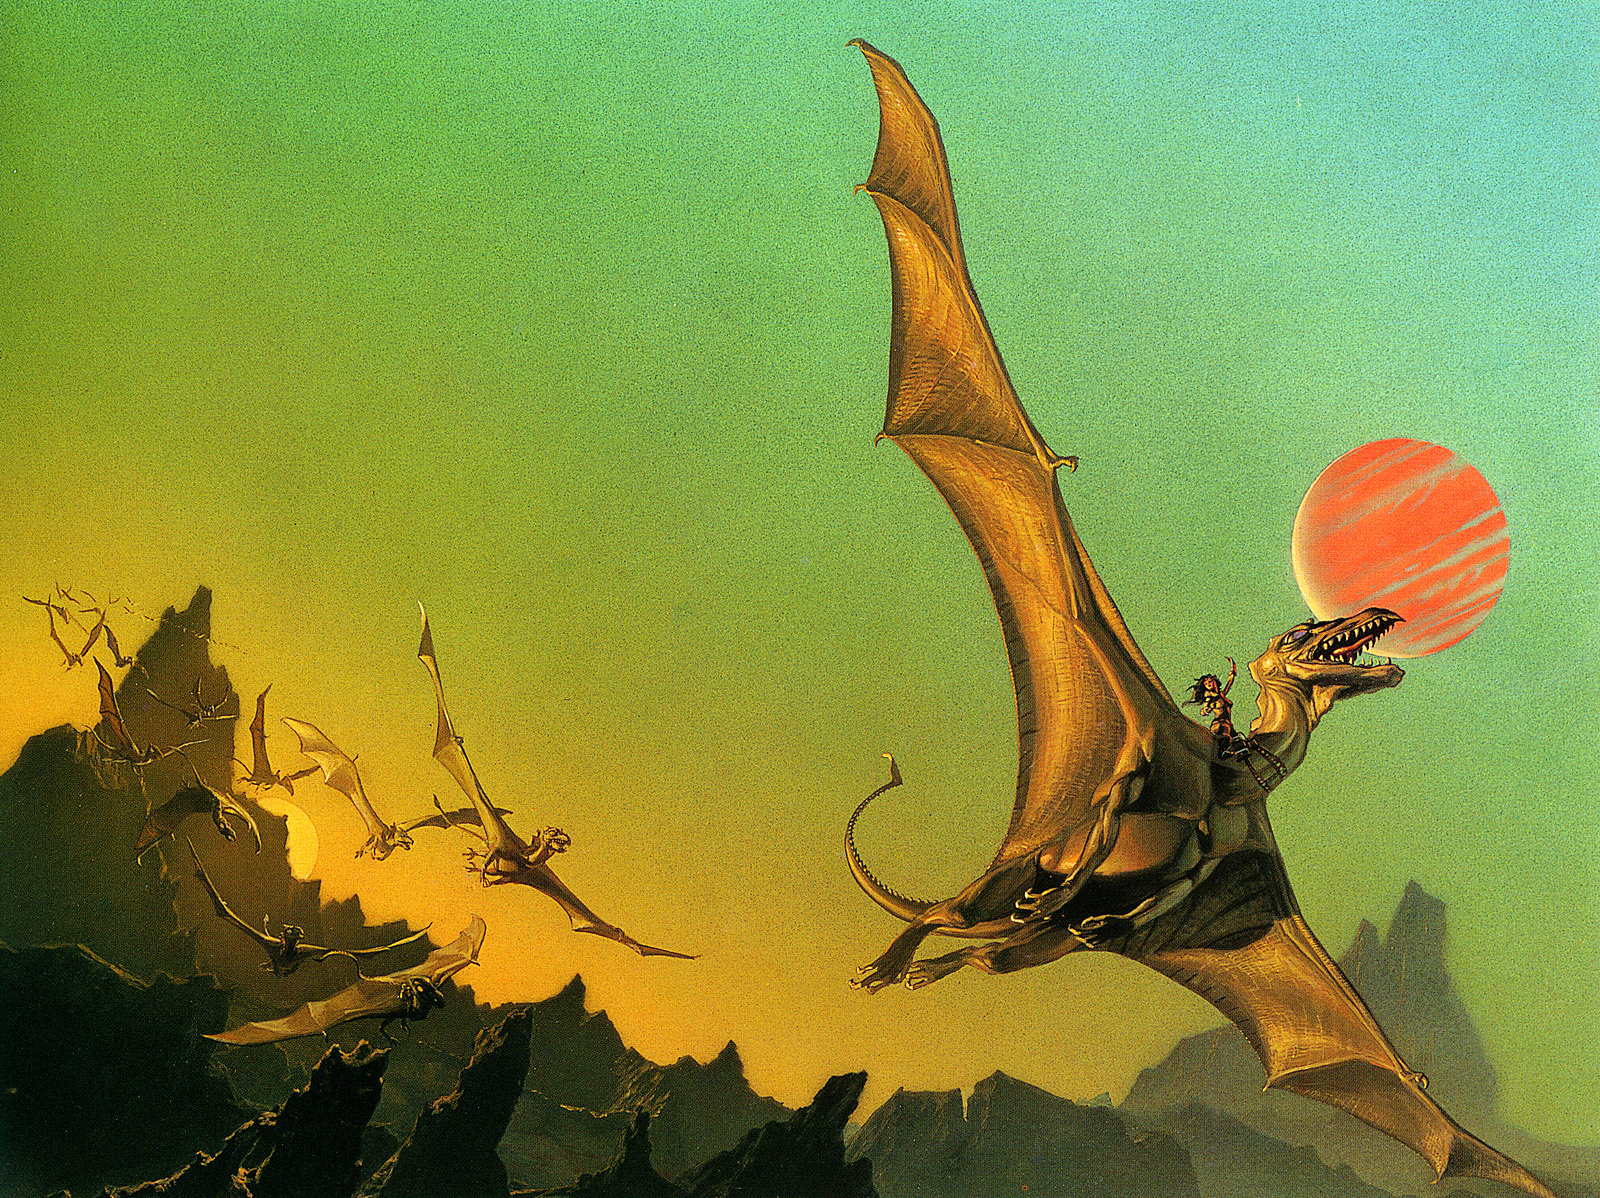 dragonflight dragonriders of pern